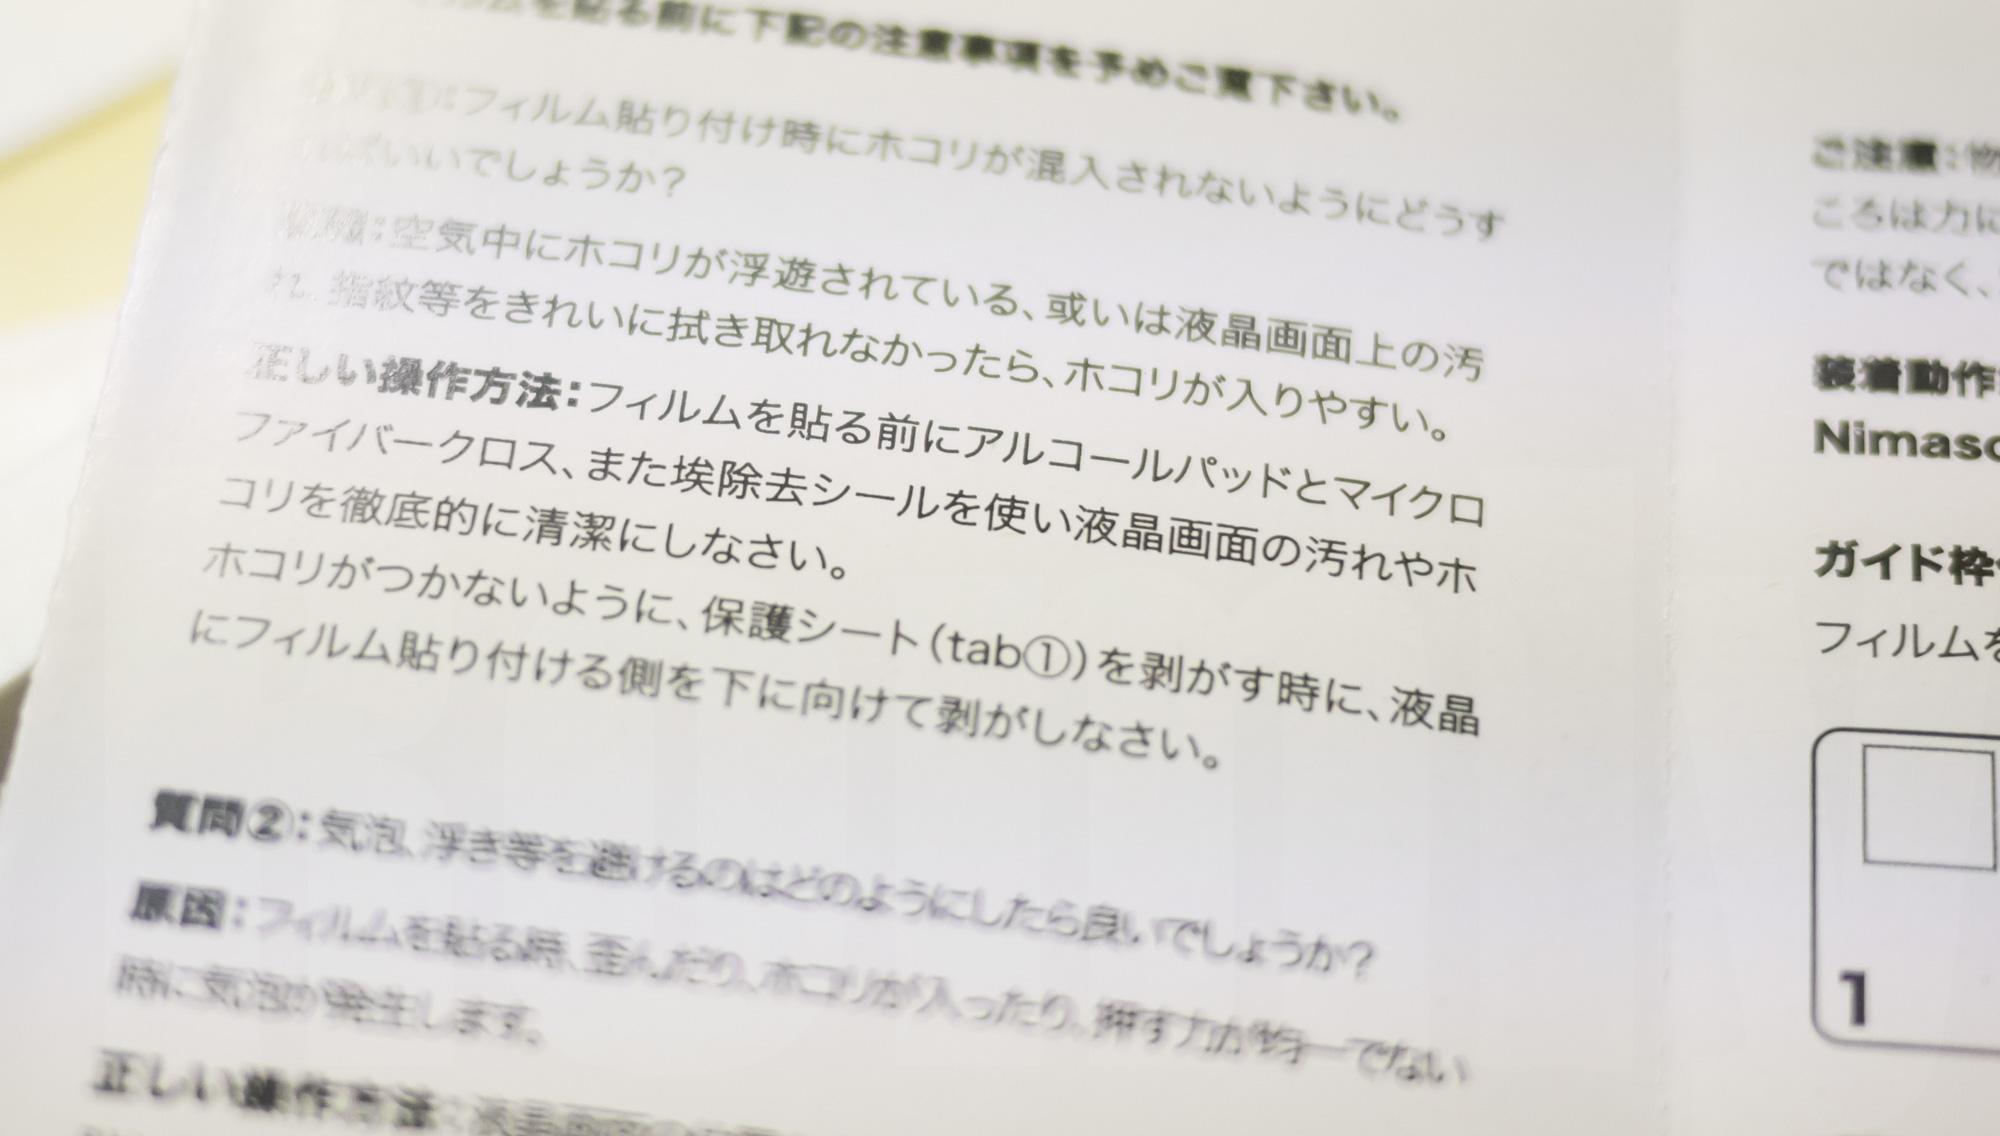 NIMASO iPhone X 強化ガラス保護フィルム 説明書